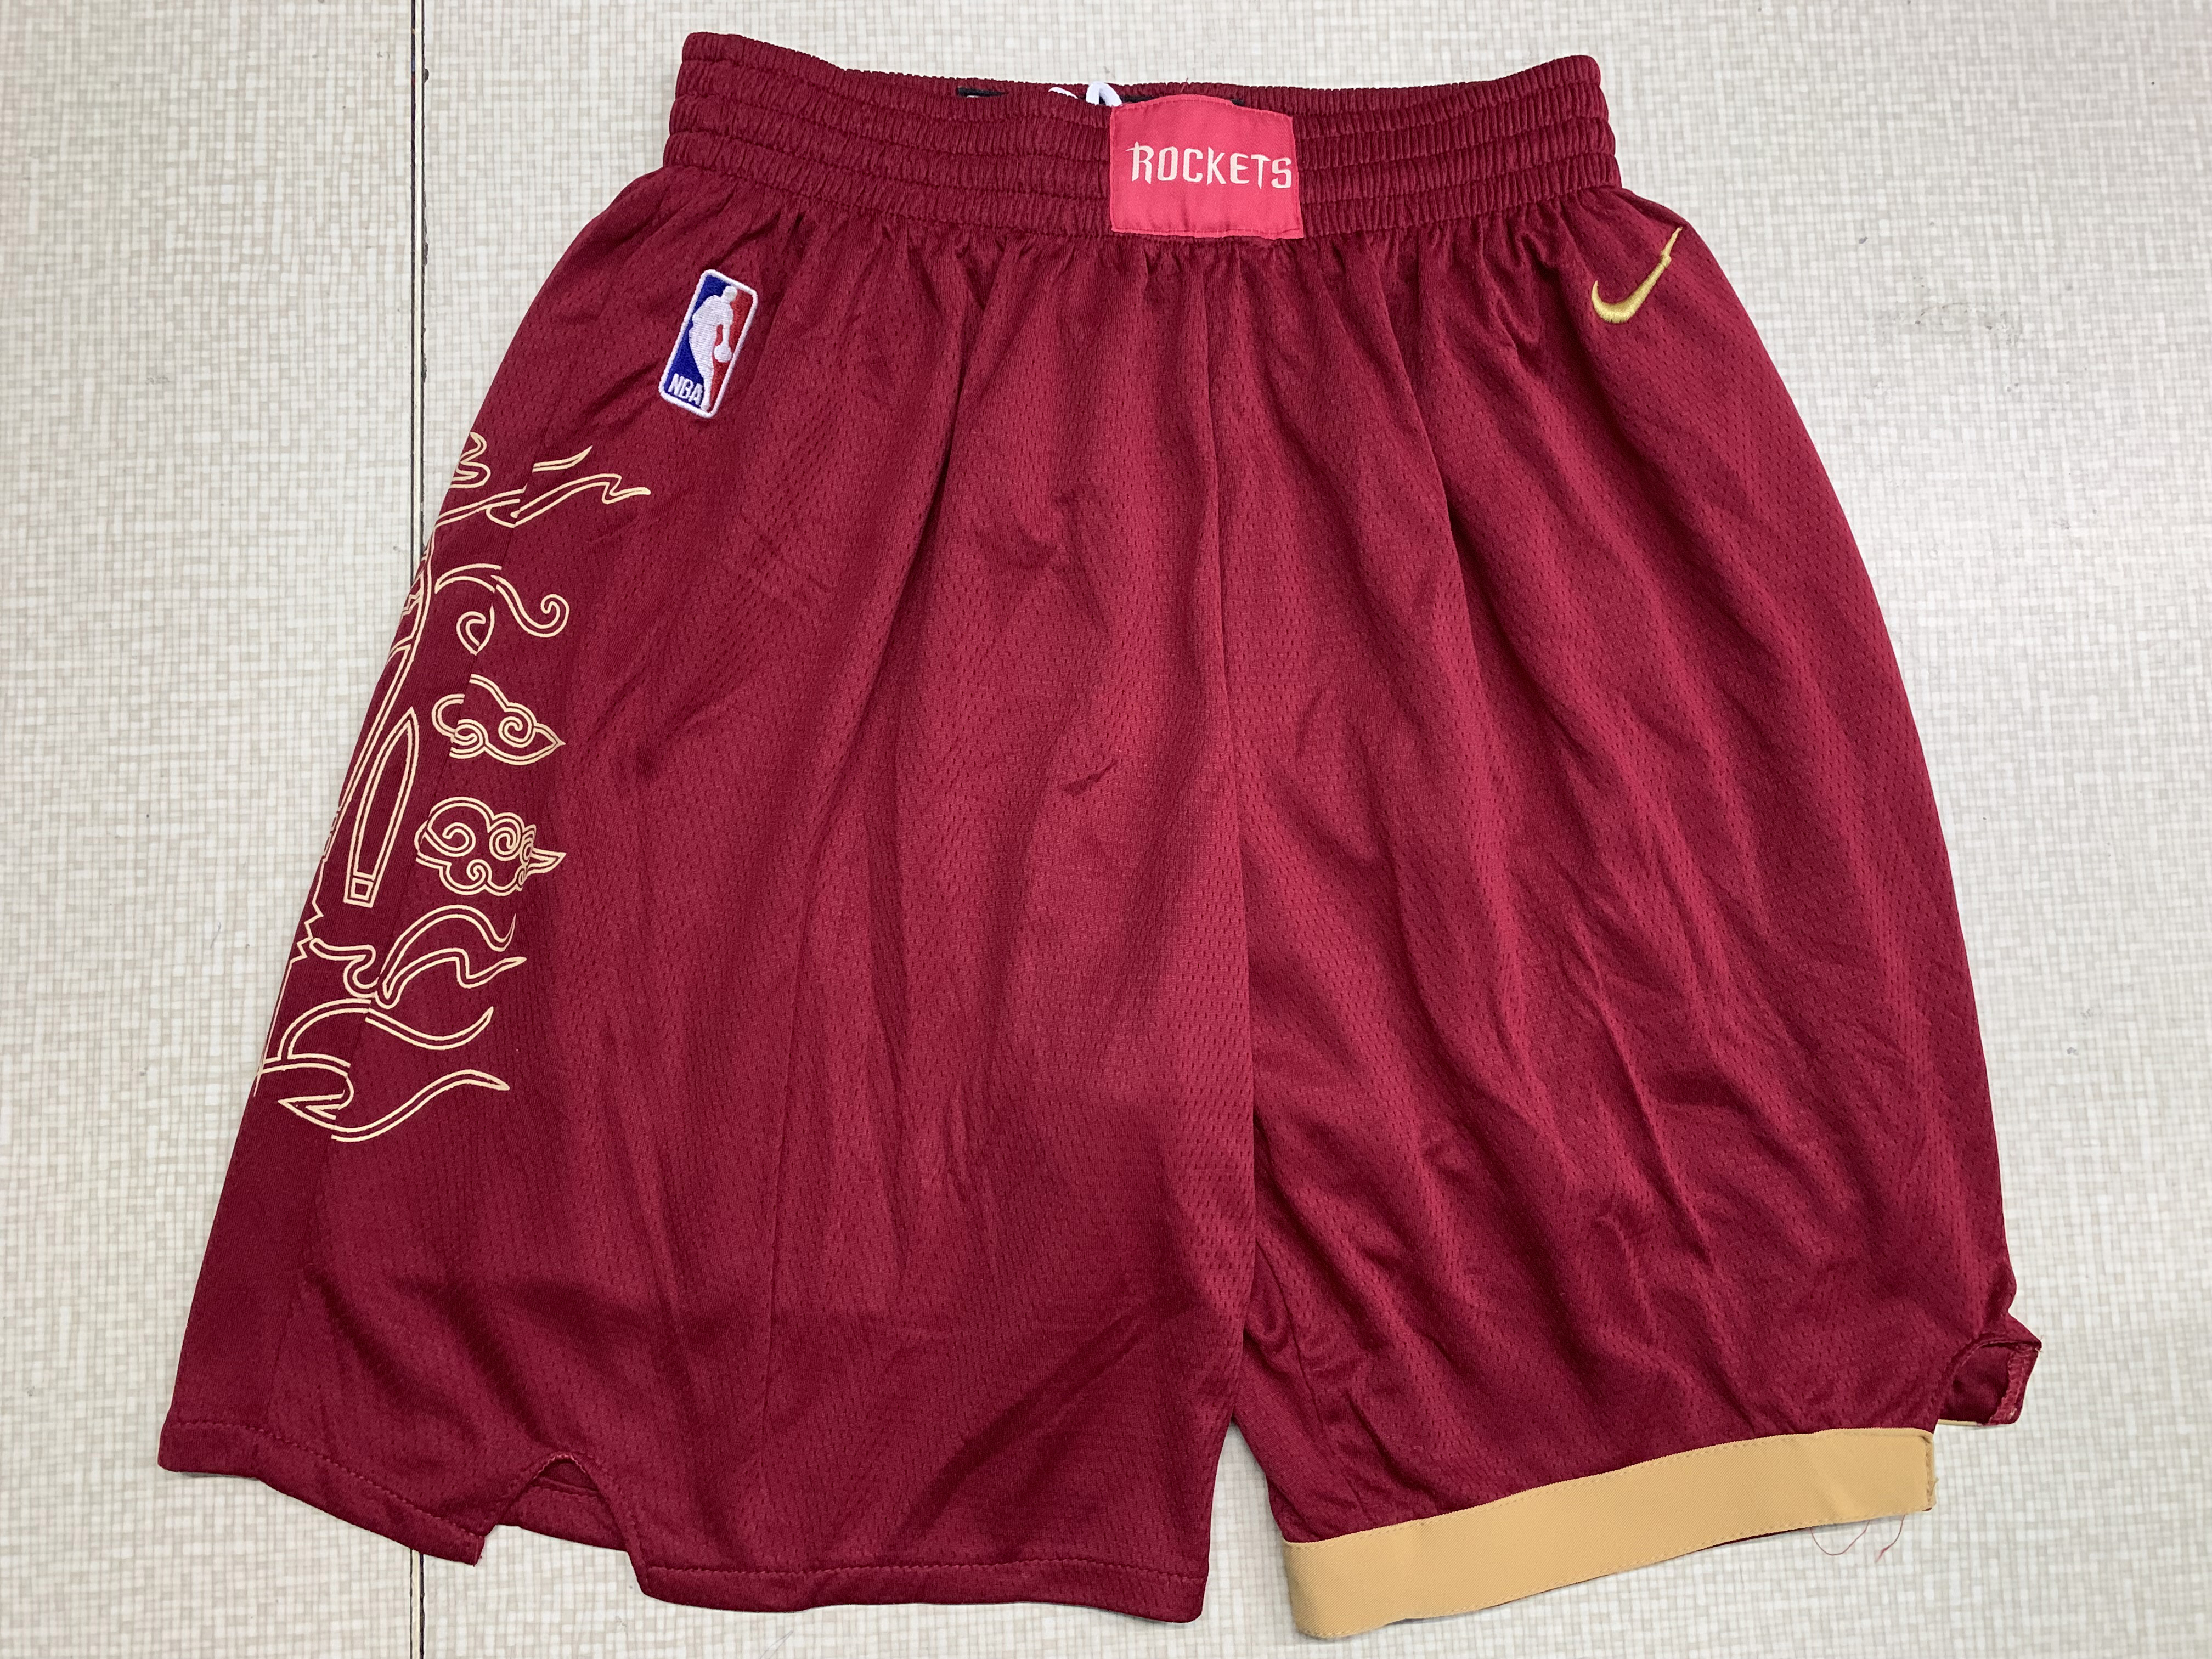 Raptors Red City Edition Nike Swingman Shorts